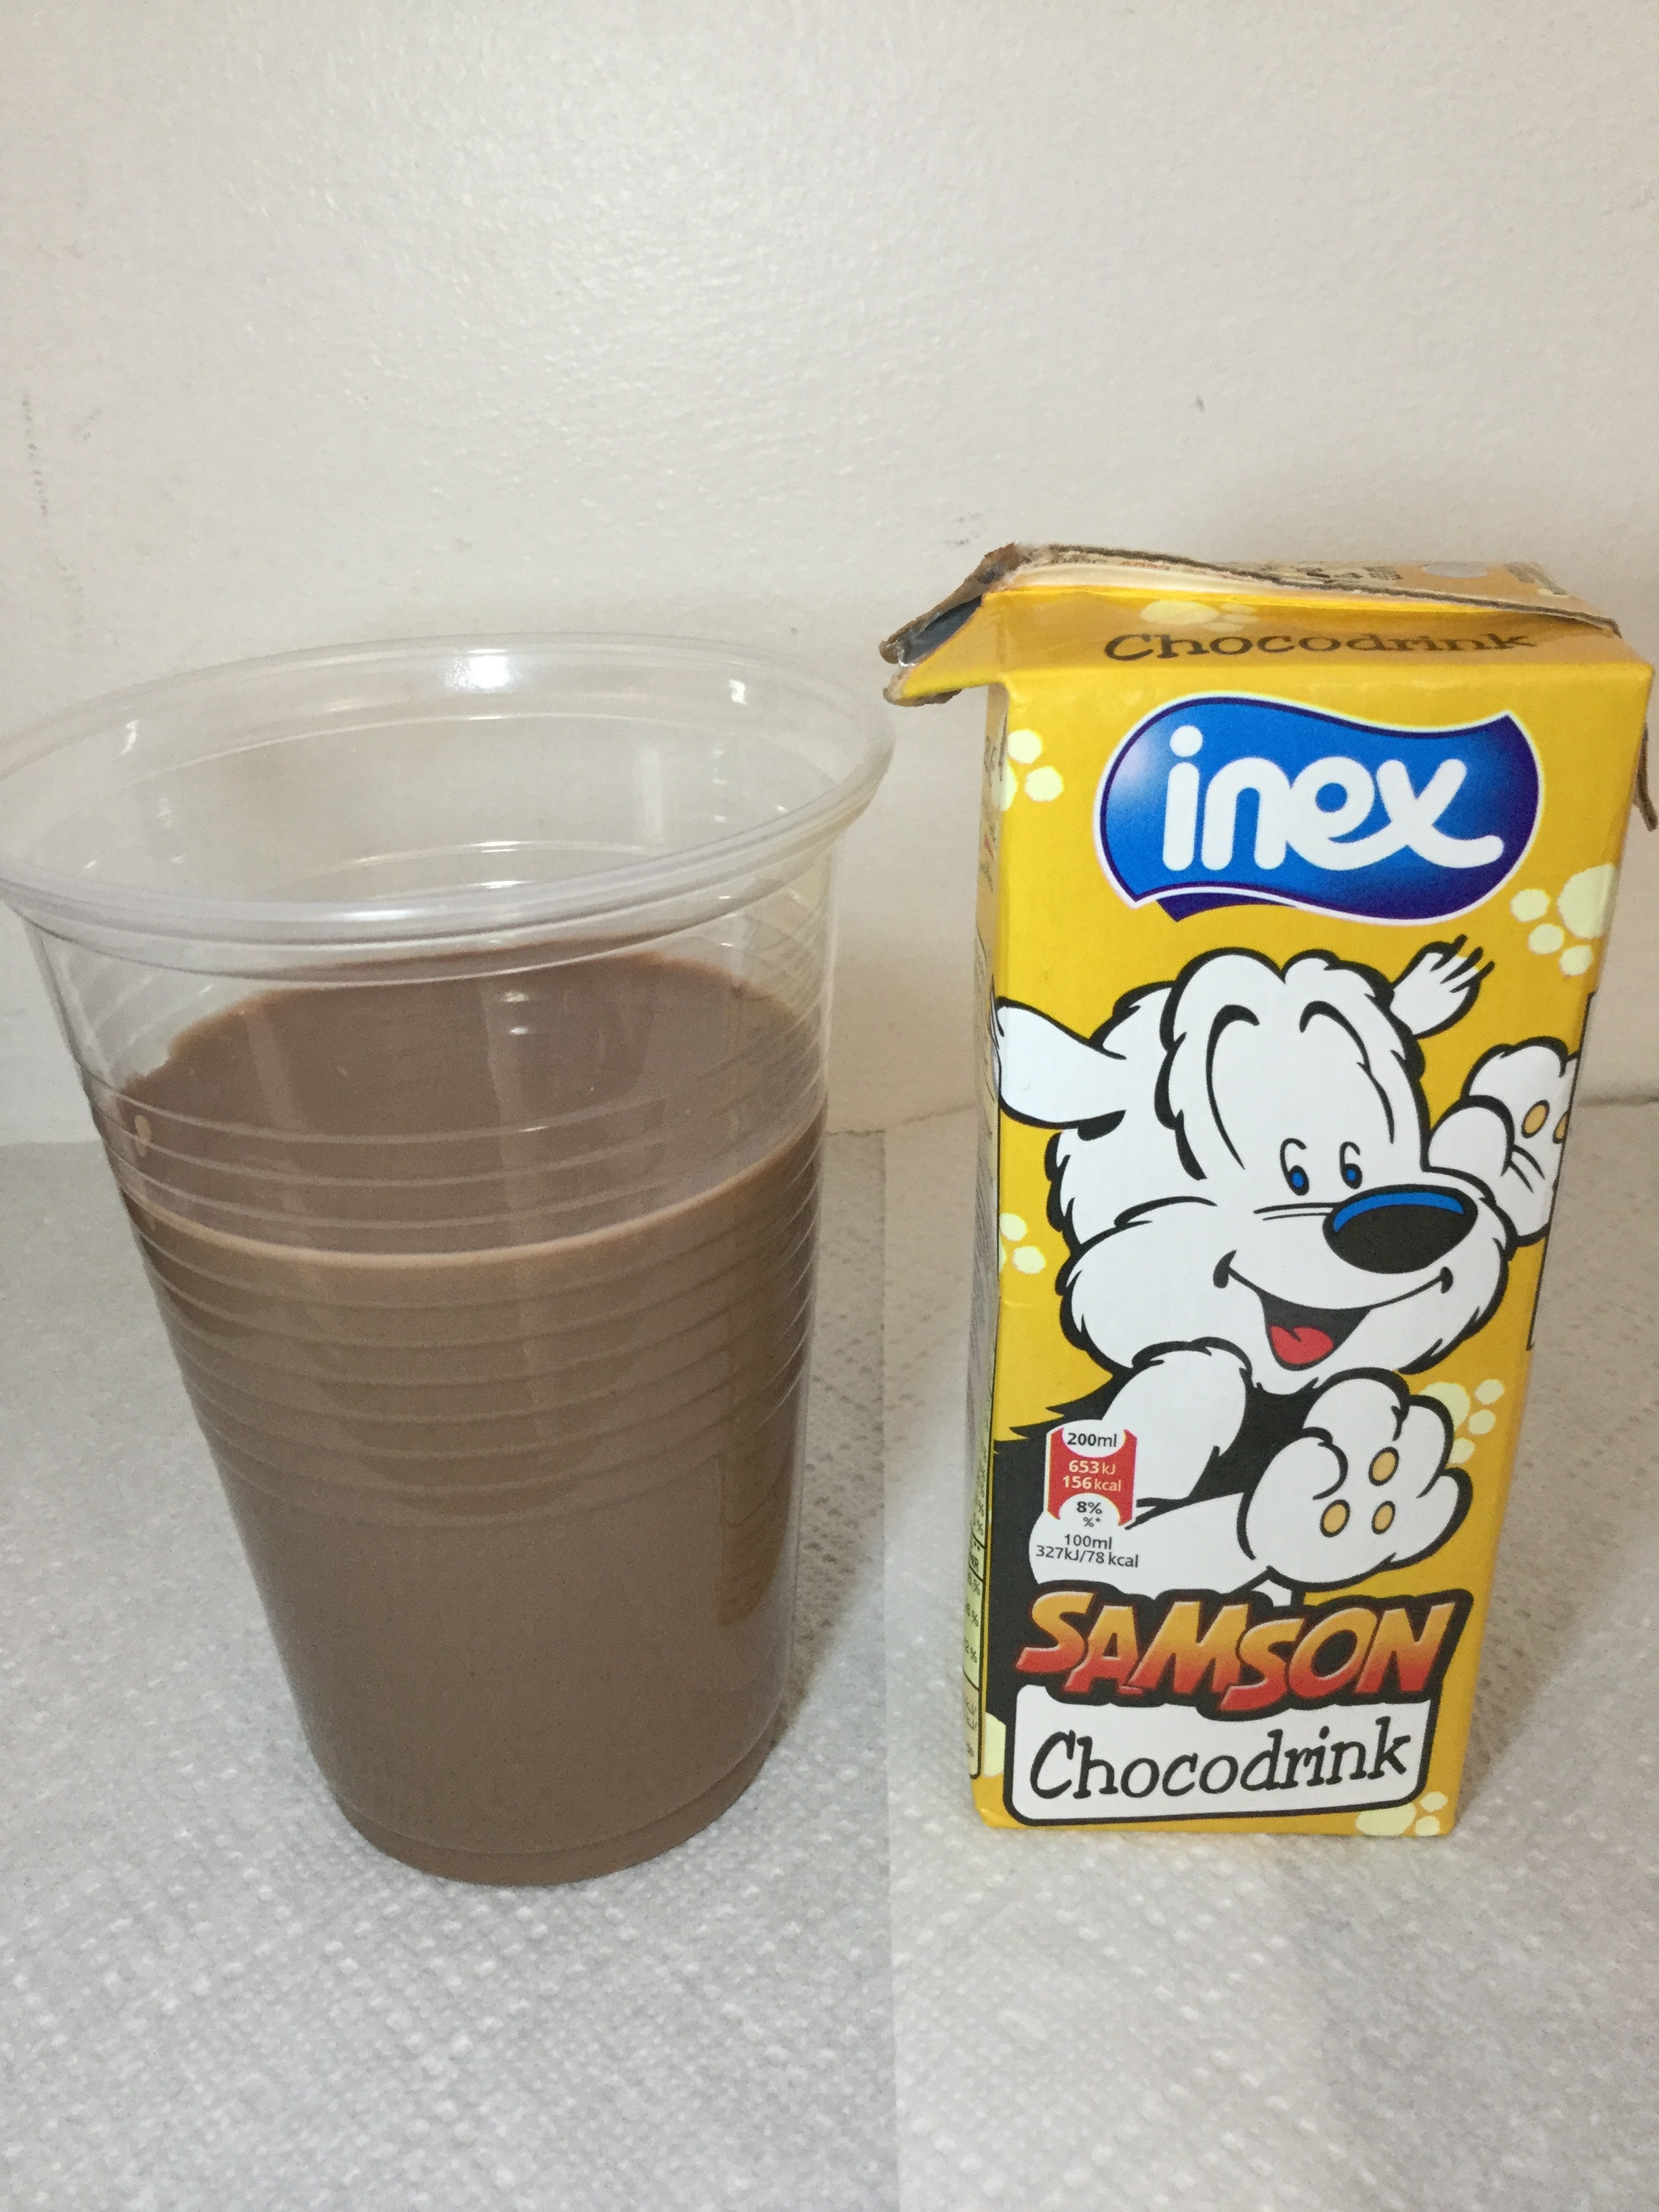 Inex Samson Chocodrink Cup